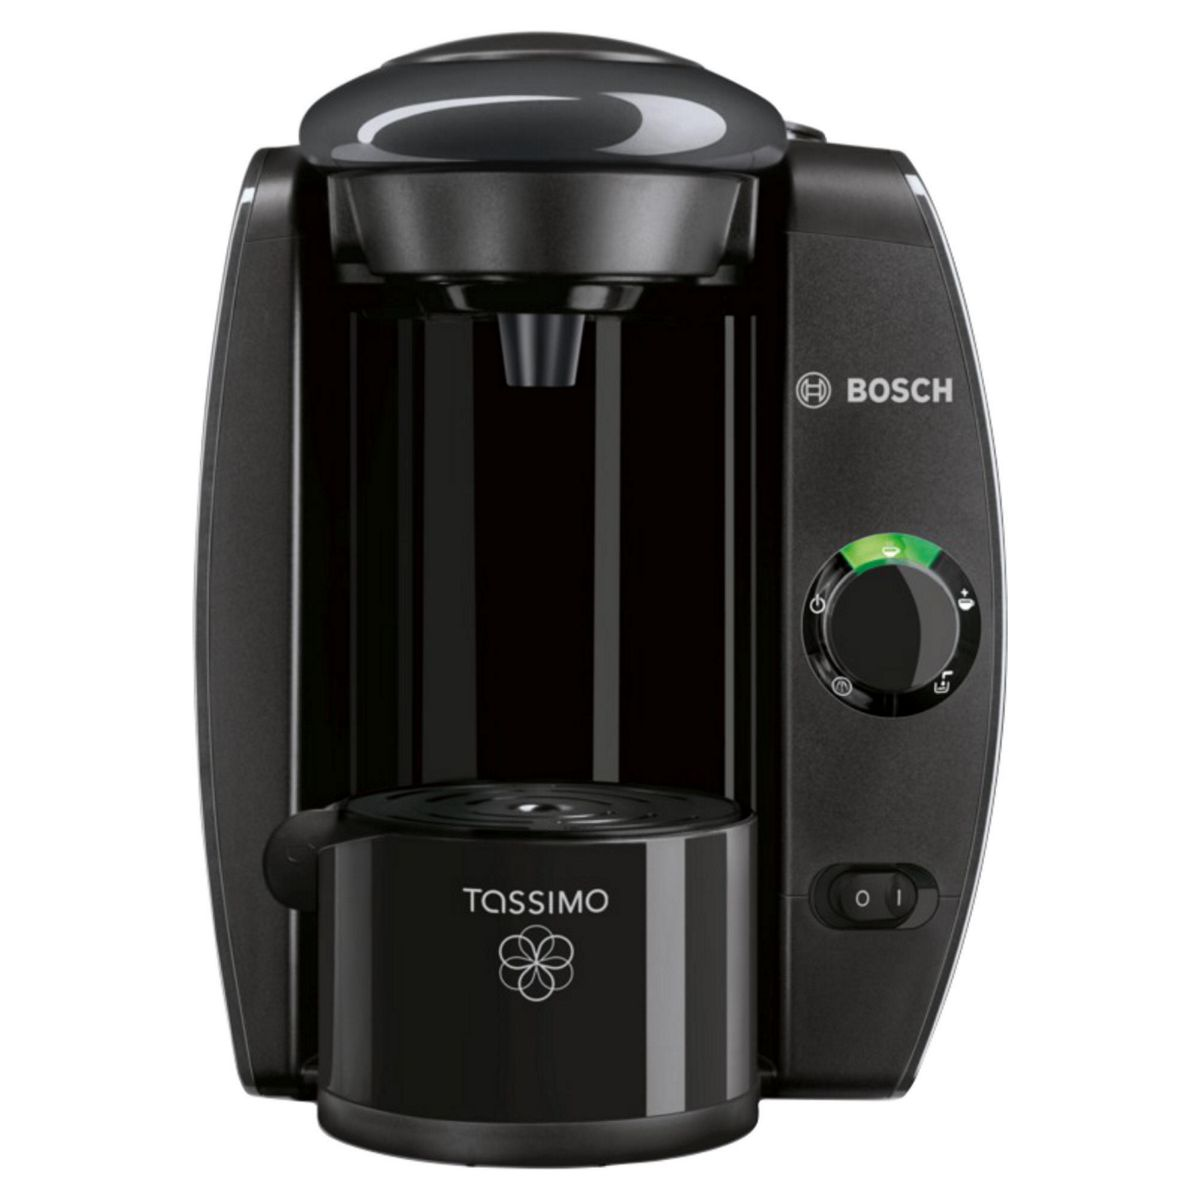 bosch tassimo fidelia tas4000gb costa coffee machine hot. Black Bedroom Furniture Sets. Home Design Ideas